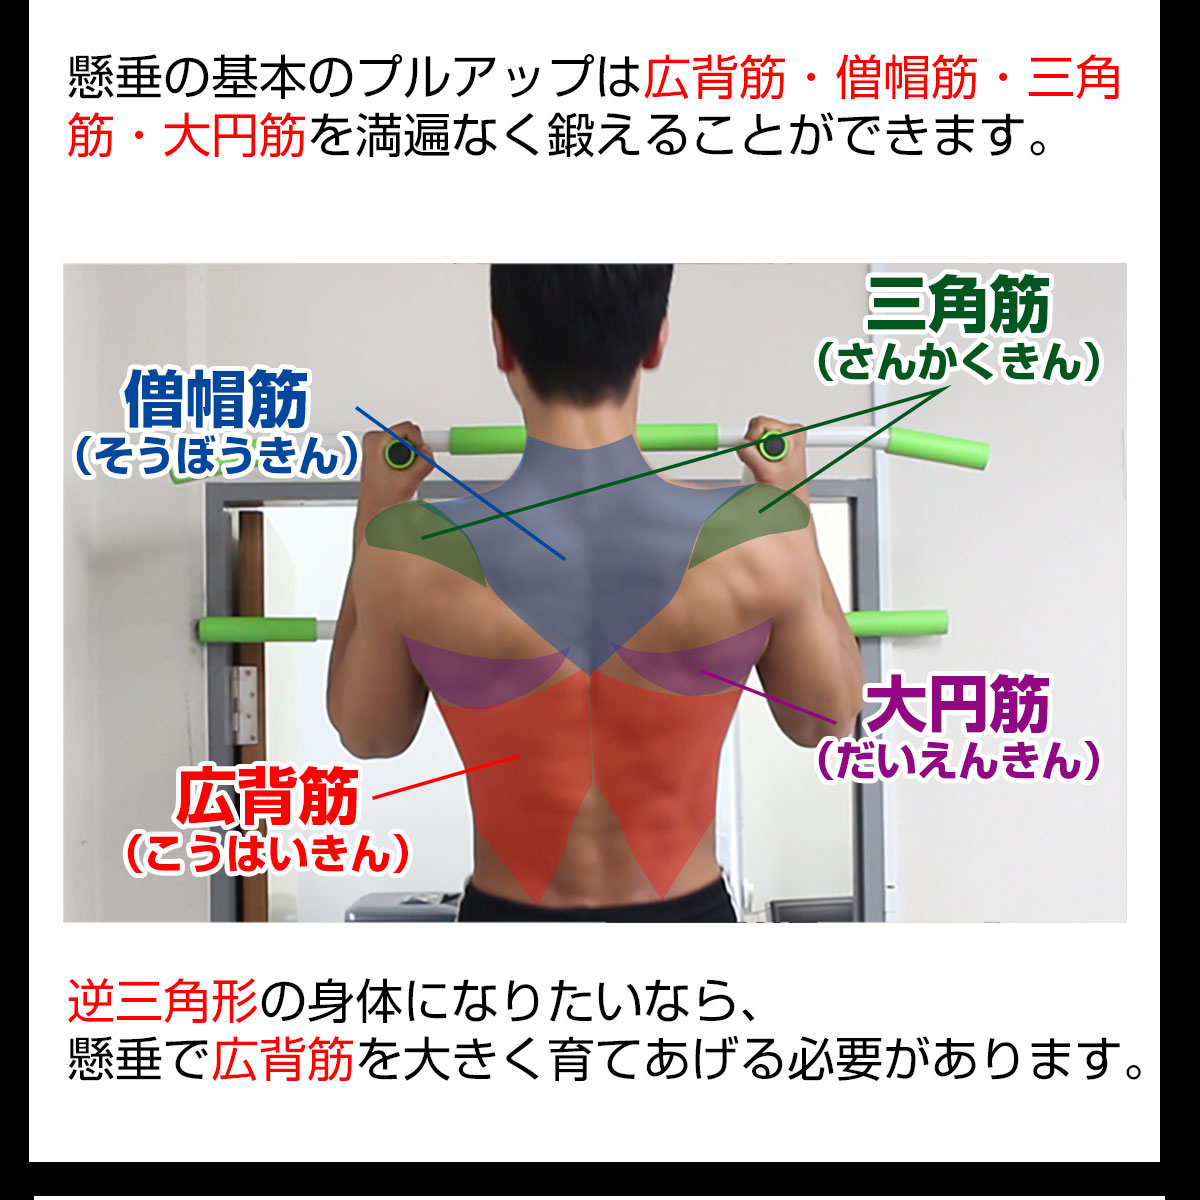 懸垂 使う 筋肉